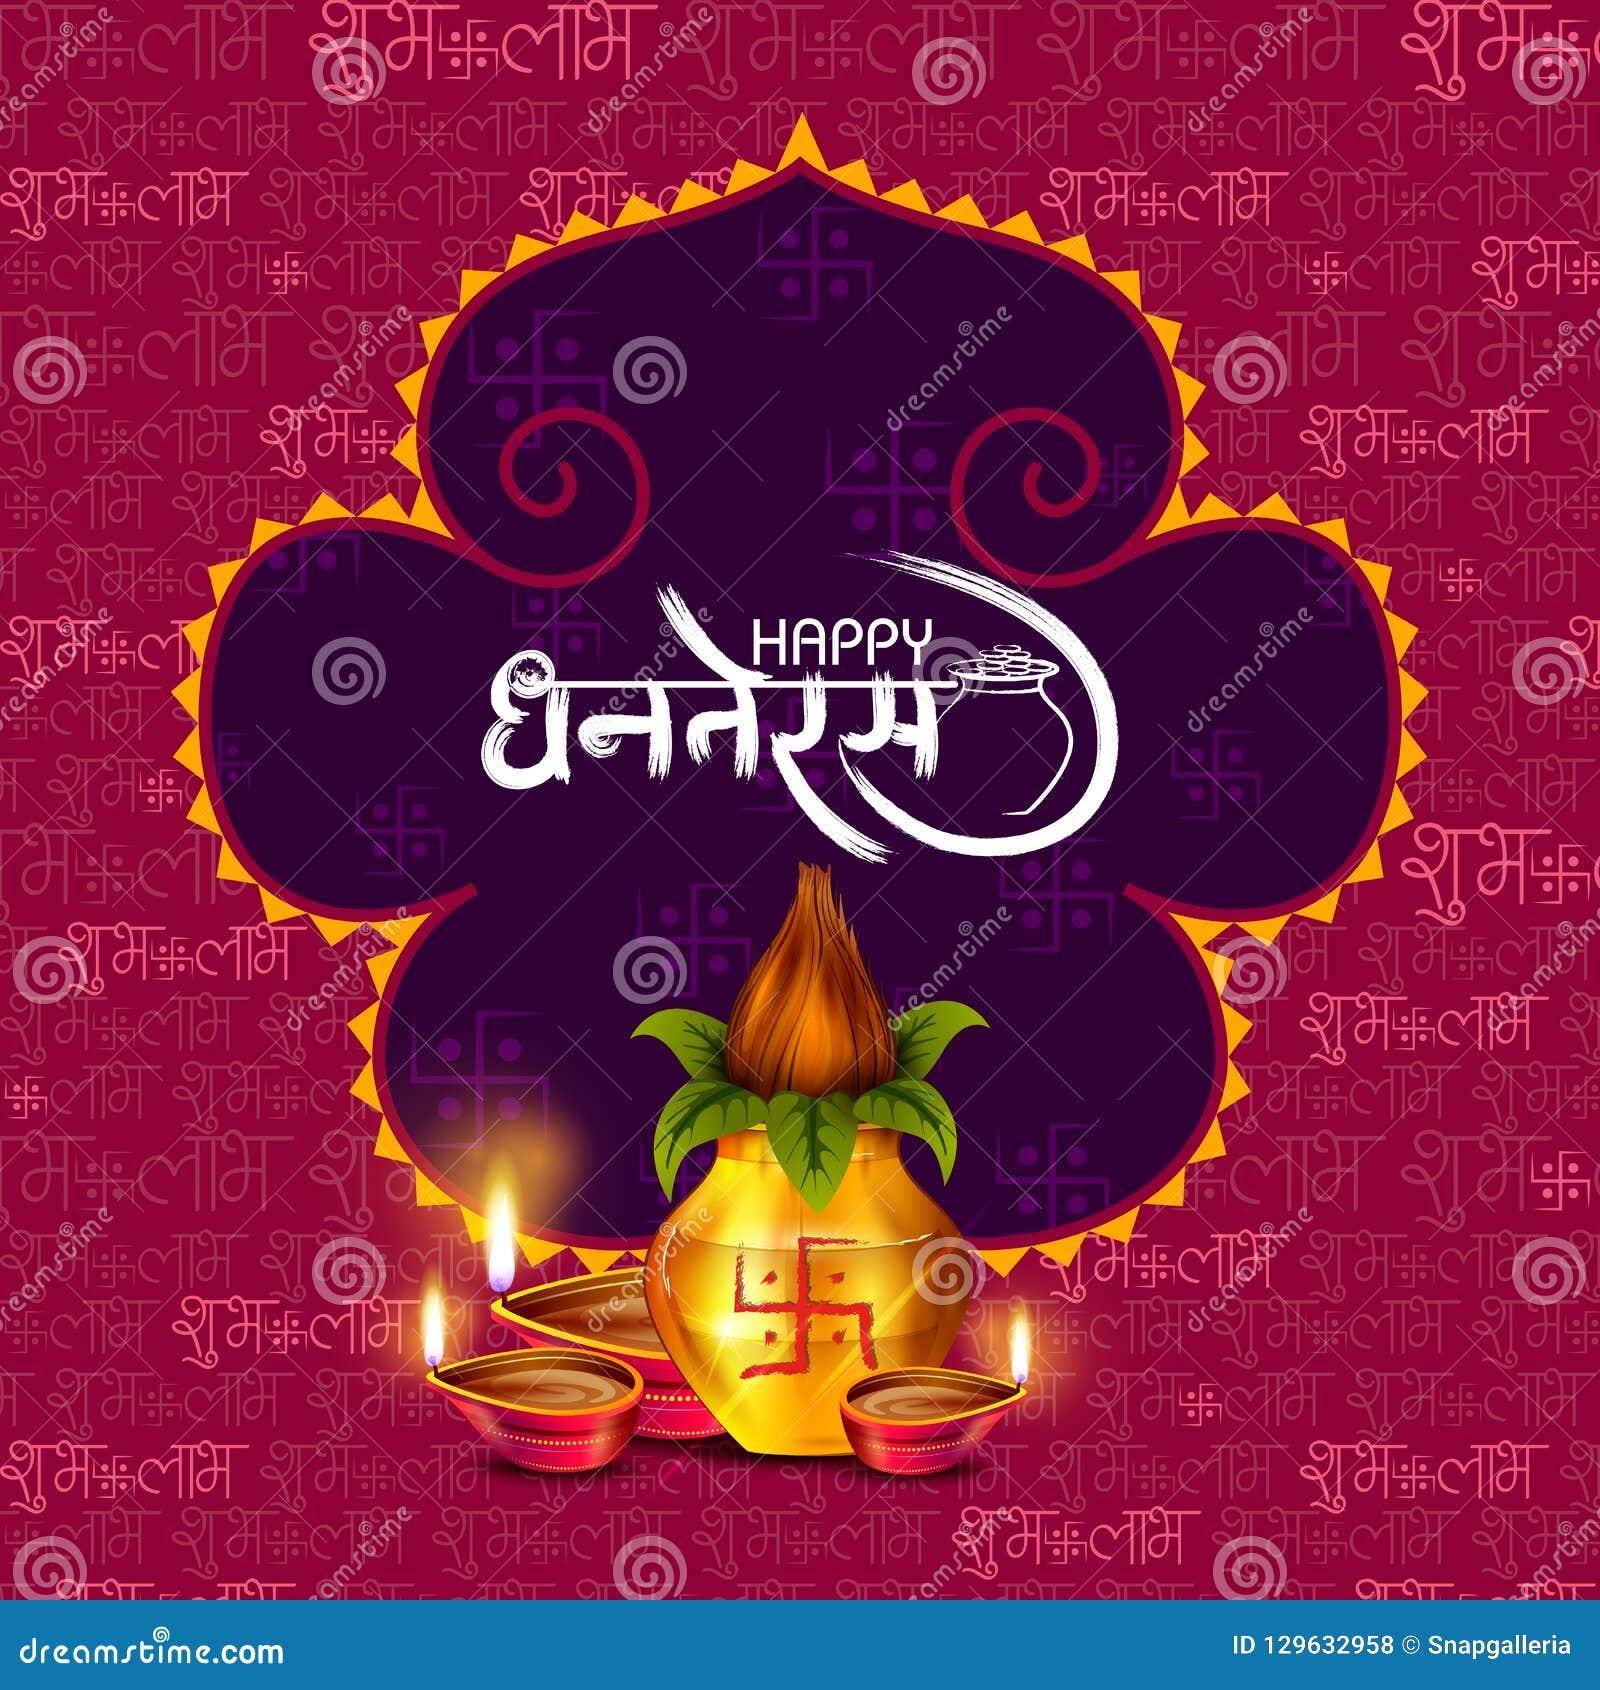 Illustration Of Decorated Happy Dhanteras Diwali Holiday